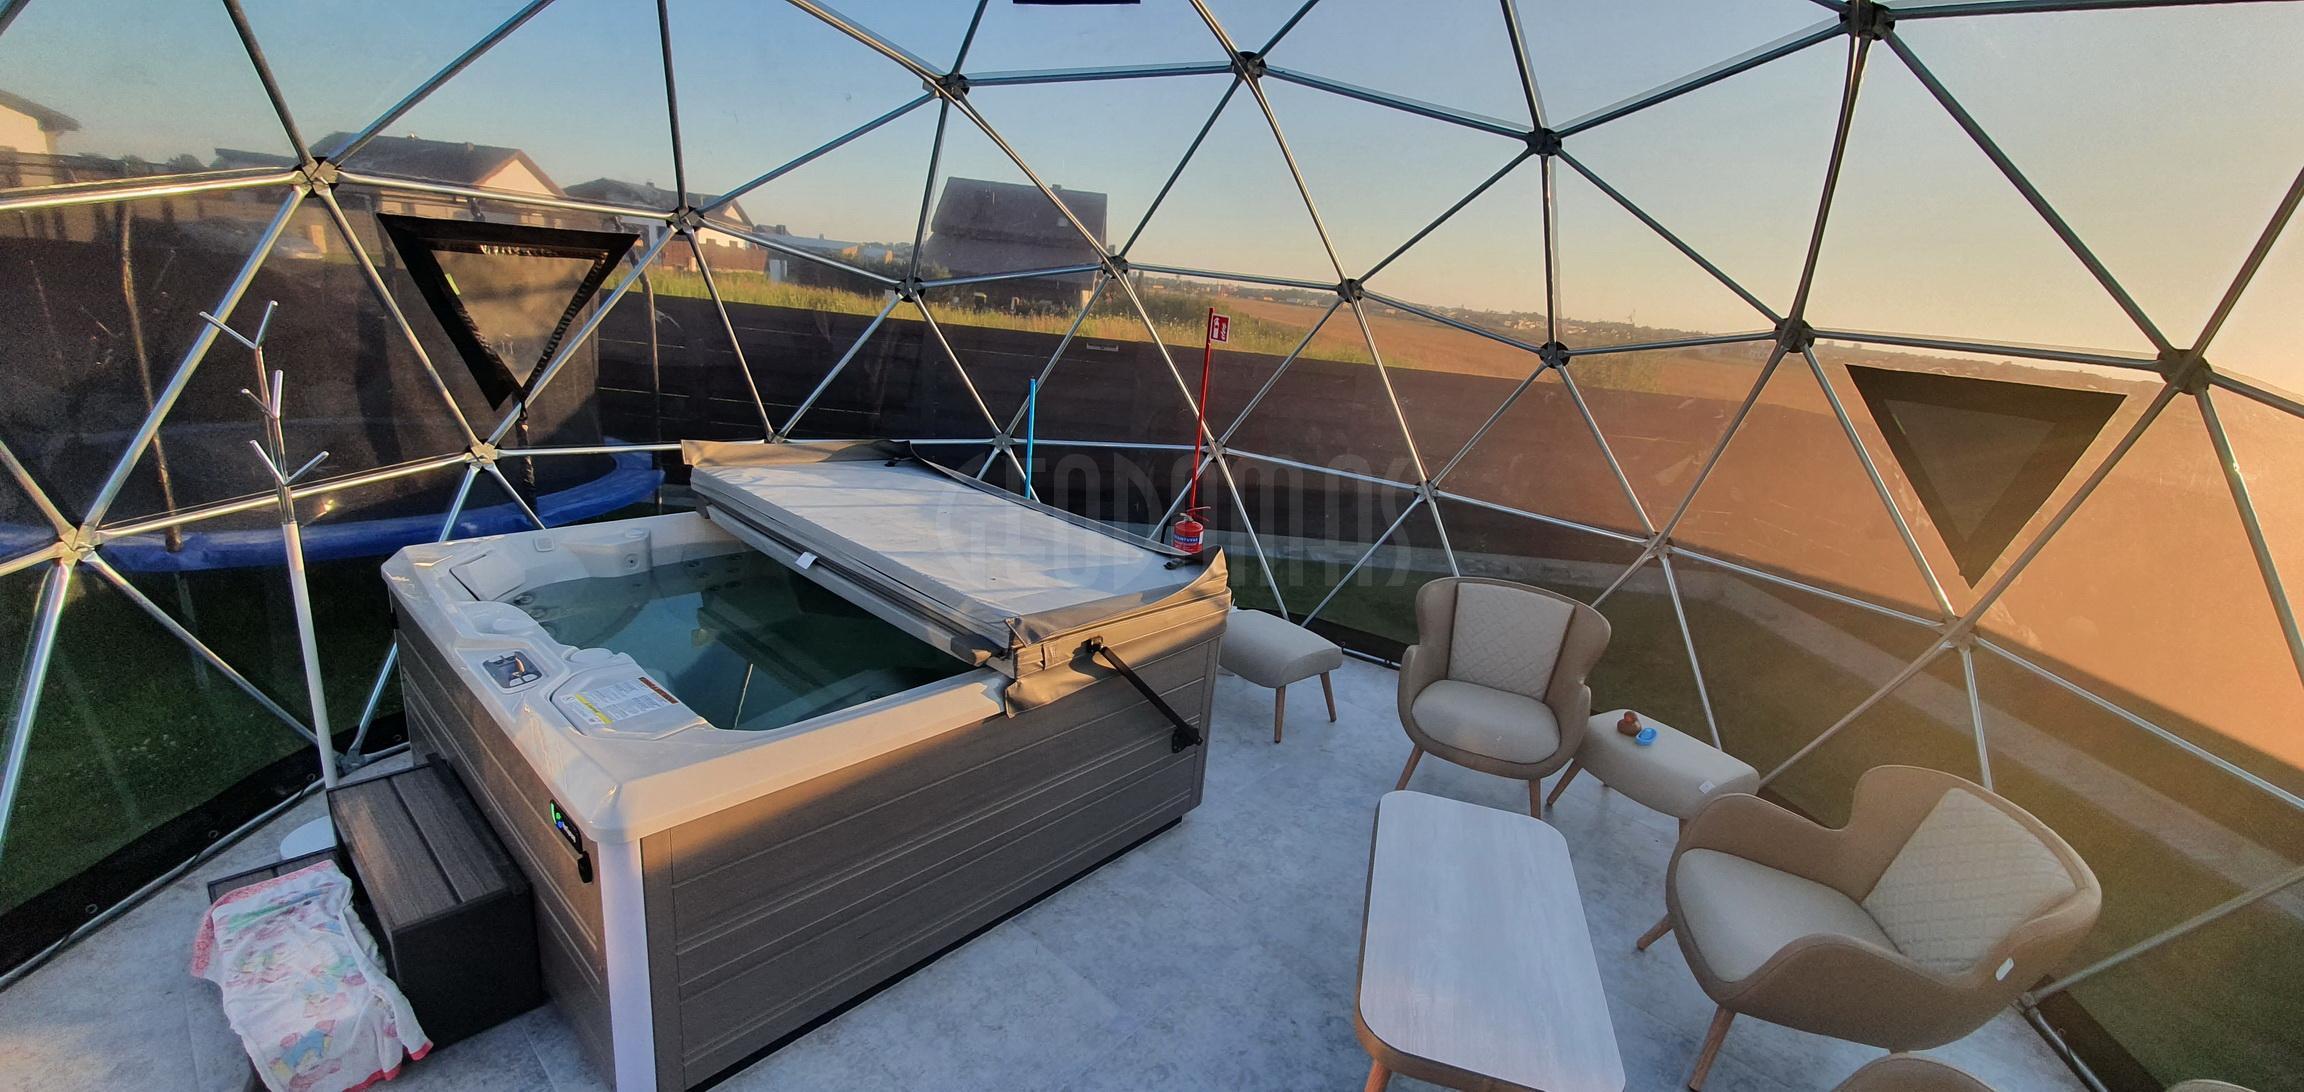 28m2 ⌀6m SPA Dome Jacuzzi – Full Transparent   Klaipeda